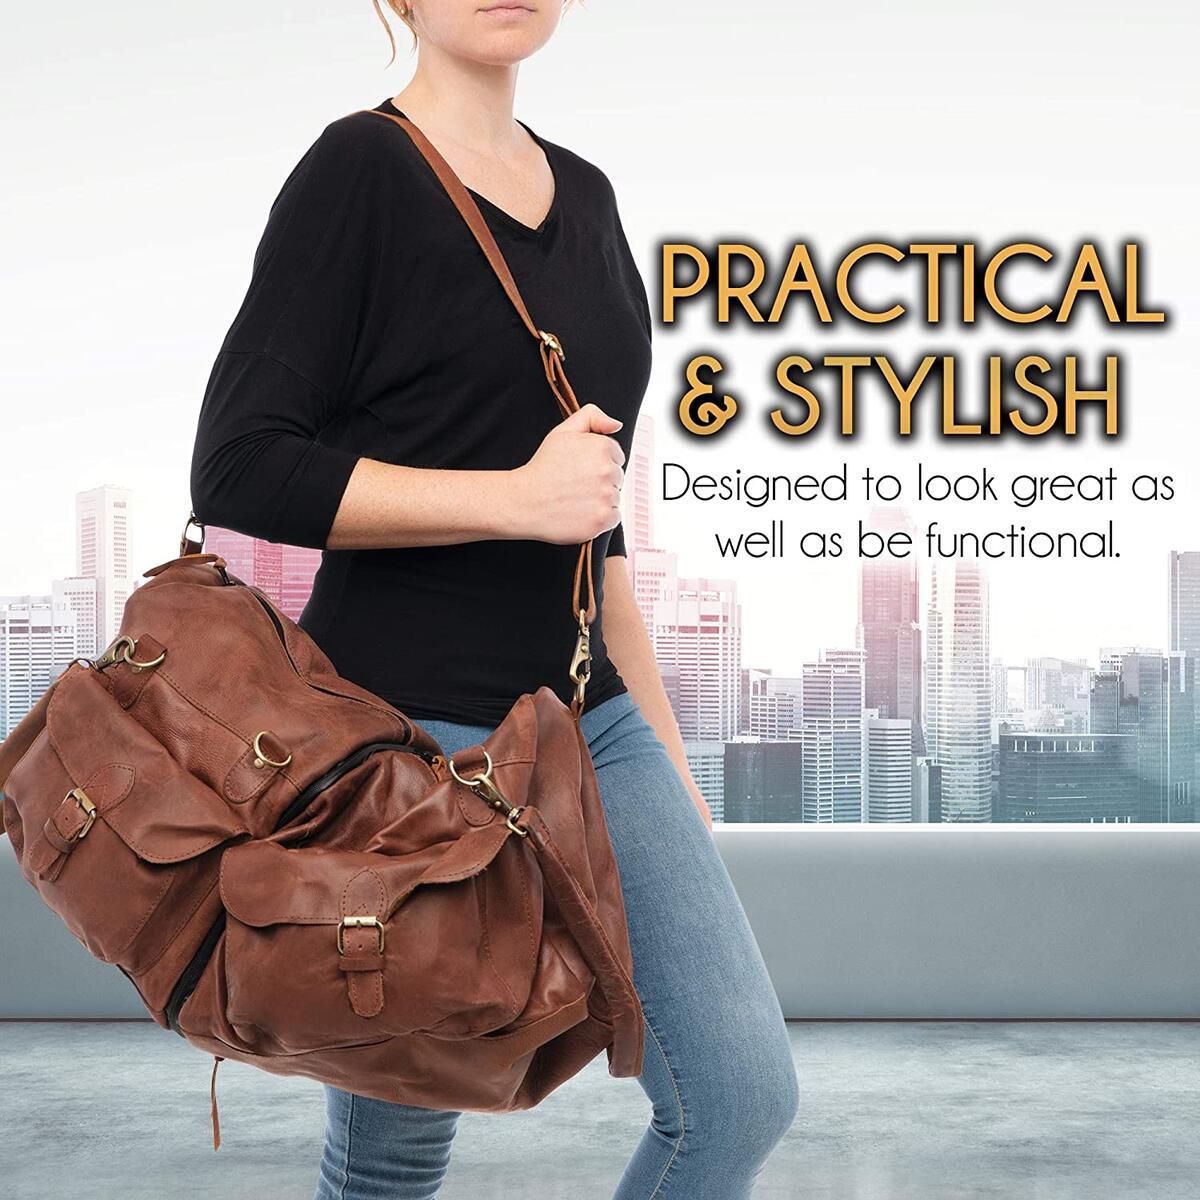 100% Leather Duffel Bag - Unique 3 Bags in 1 Design